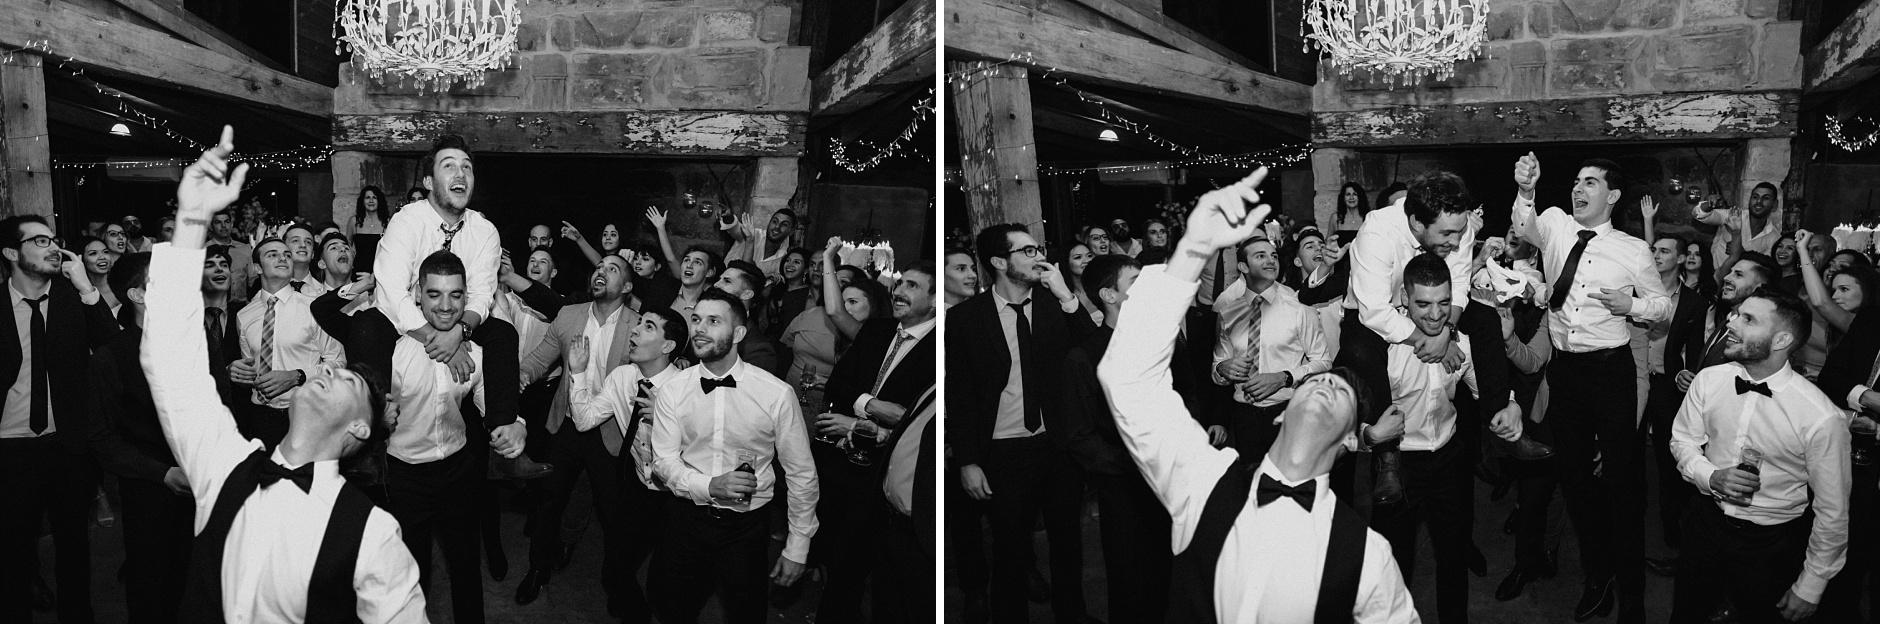 cassandra&cameron1366ab_Peppers-Creek-Wedding.jpg